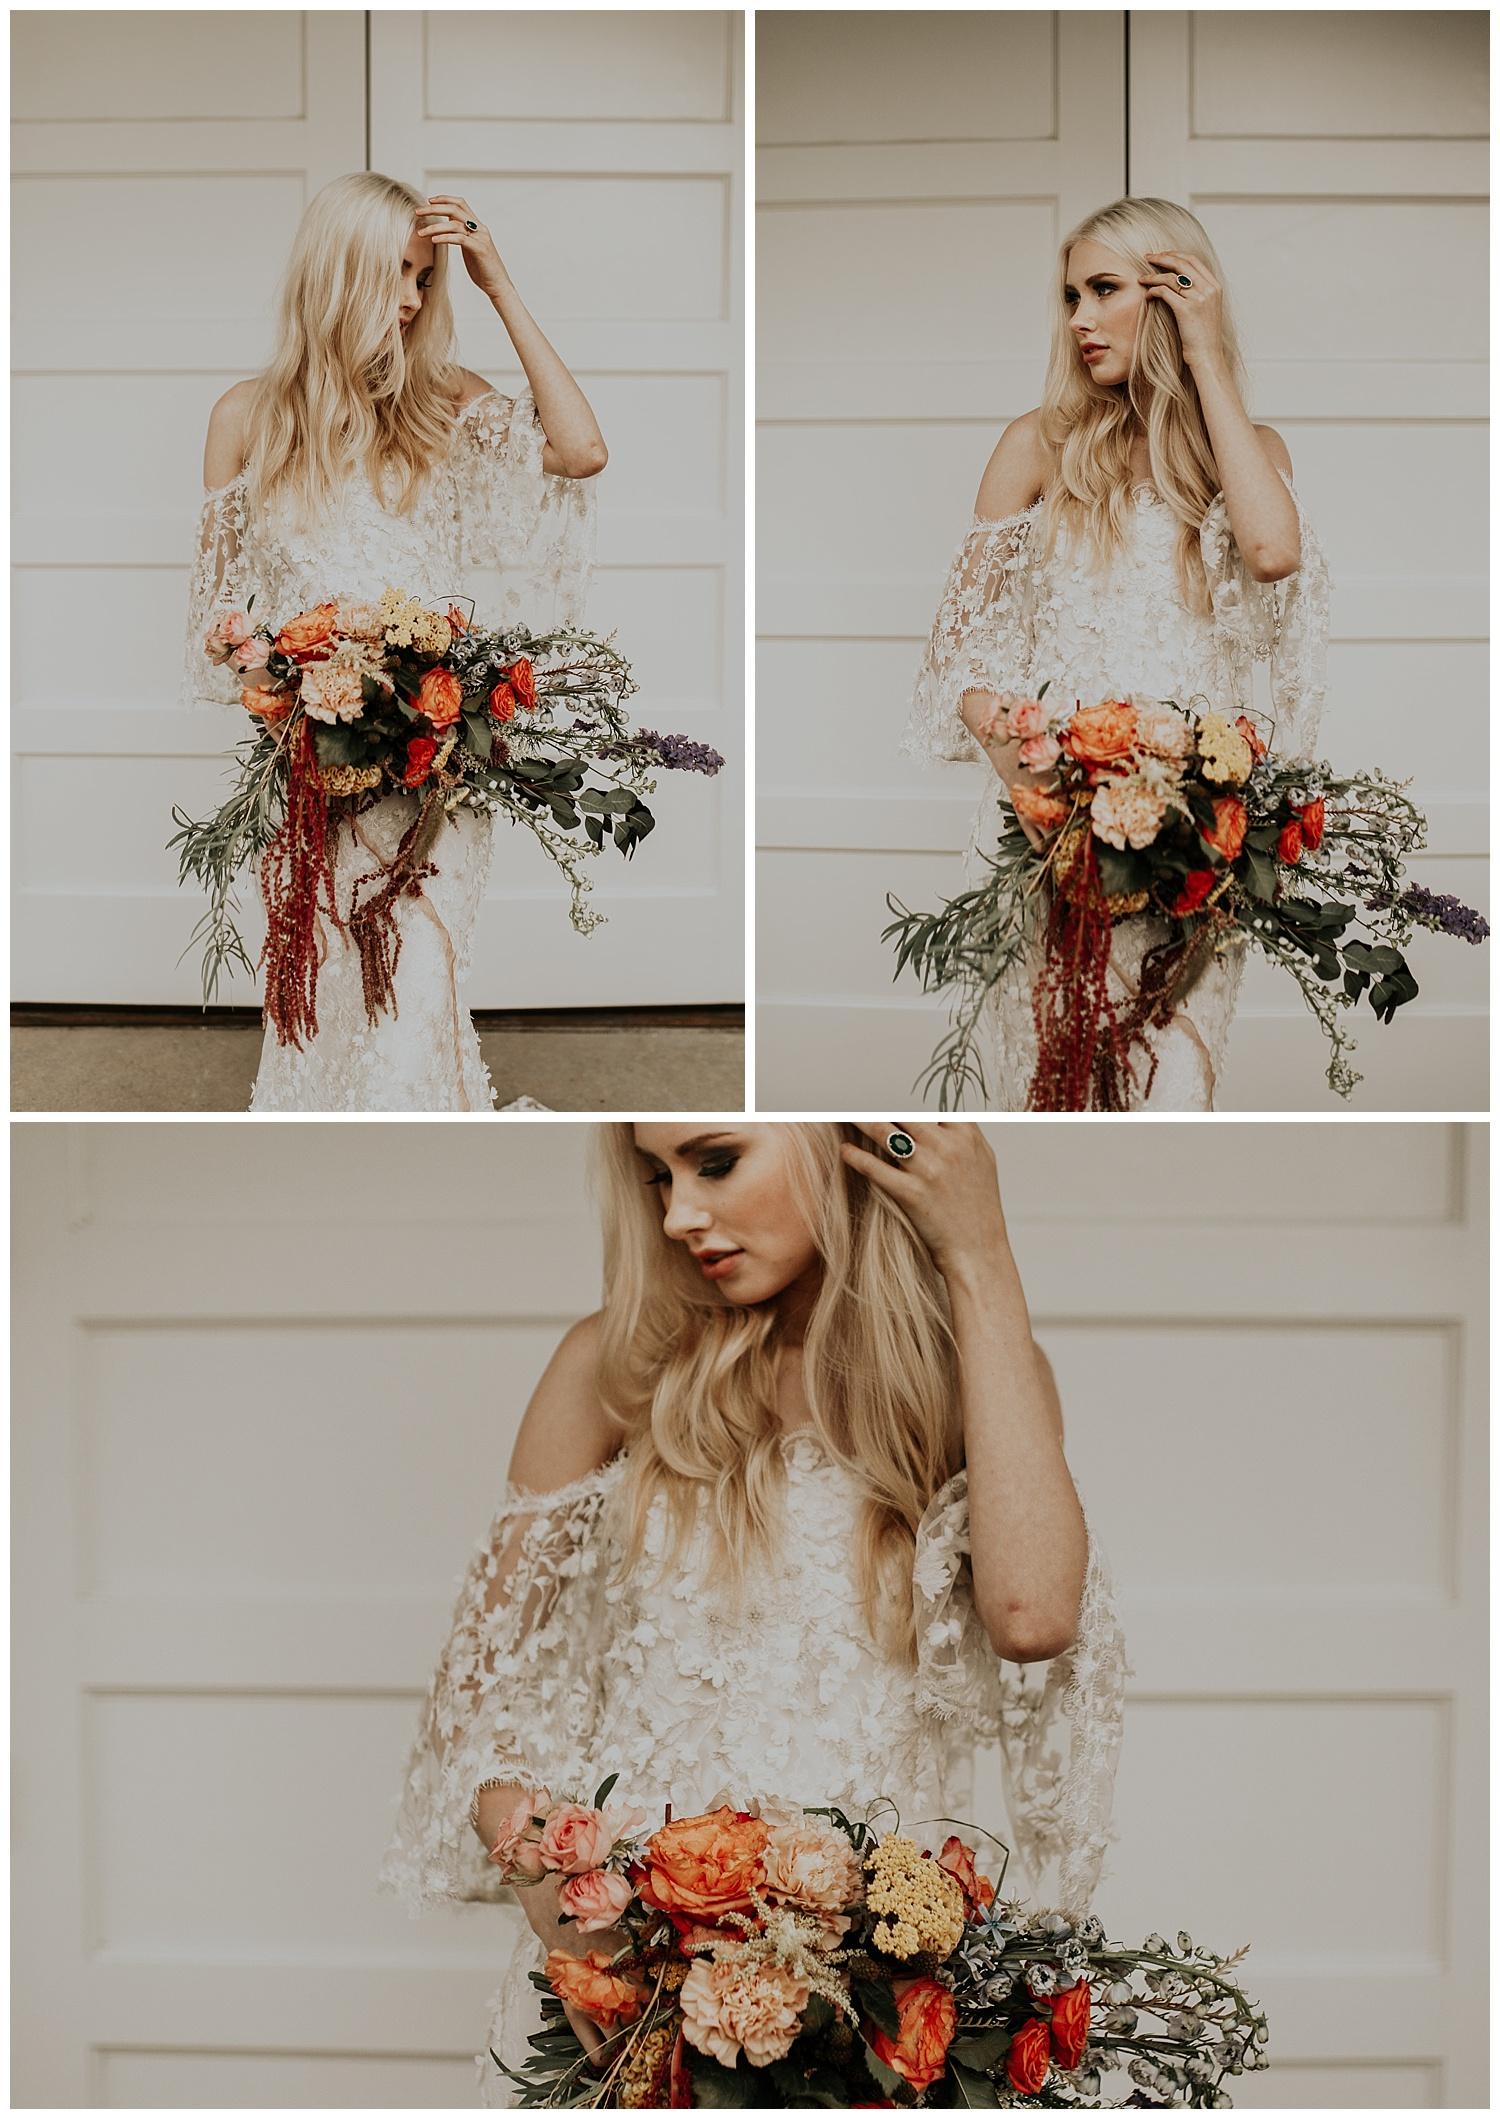 Laken-Mackenzie-Photography-Cliff-House-Dallas-Wedding-Photographer21.jpg